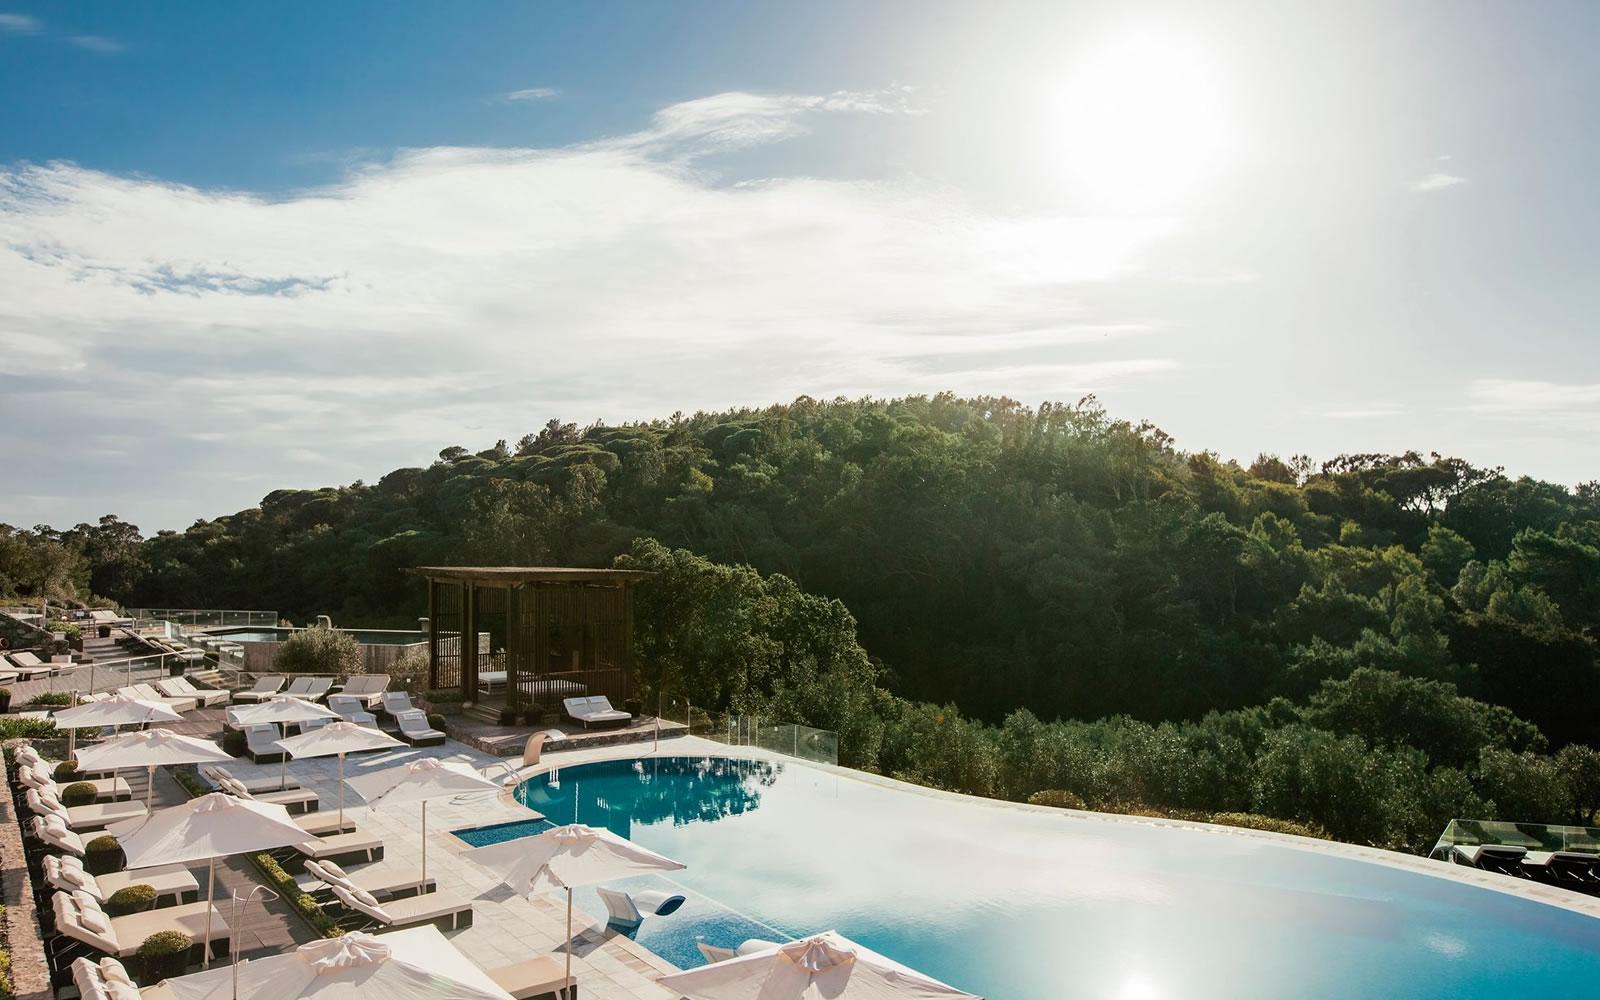 Lisbon Coast & Sintra Babymoon at Penha Longa, A Ritz-Carlton® Hotel